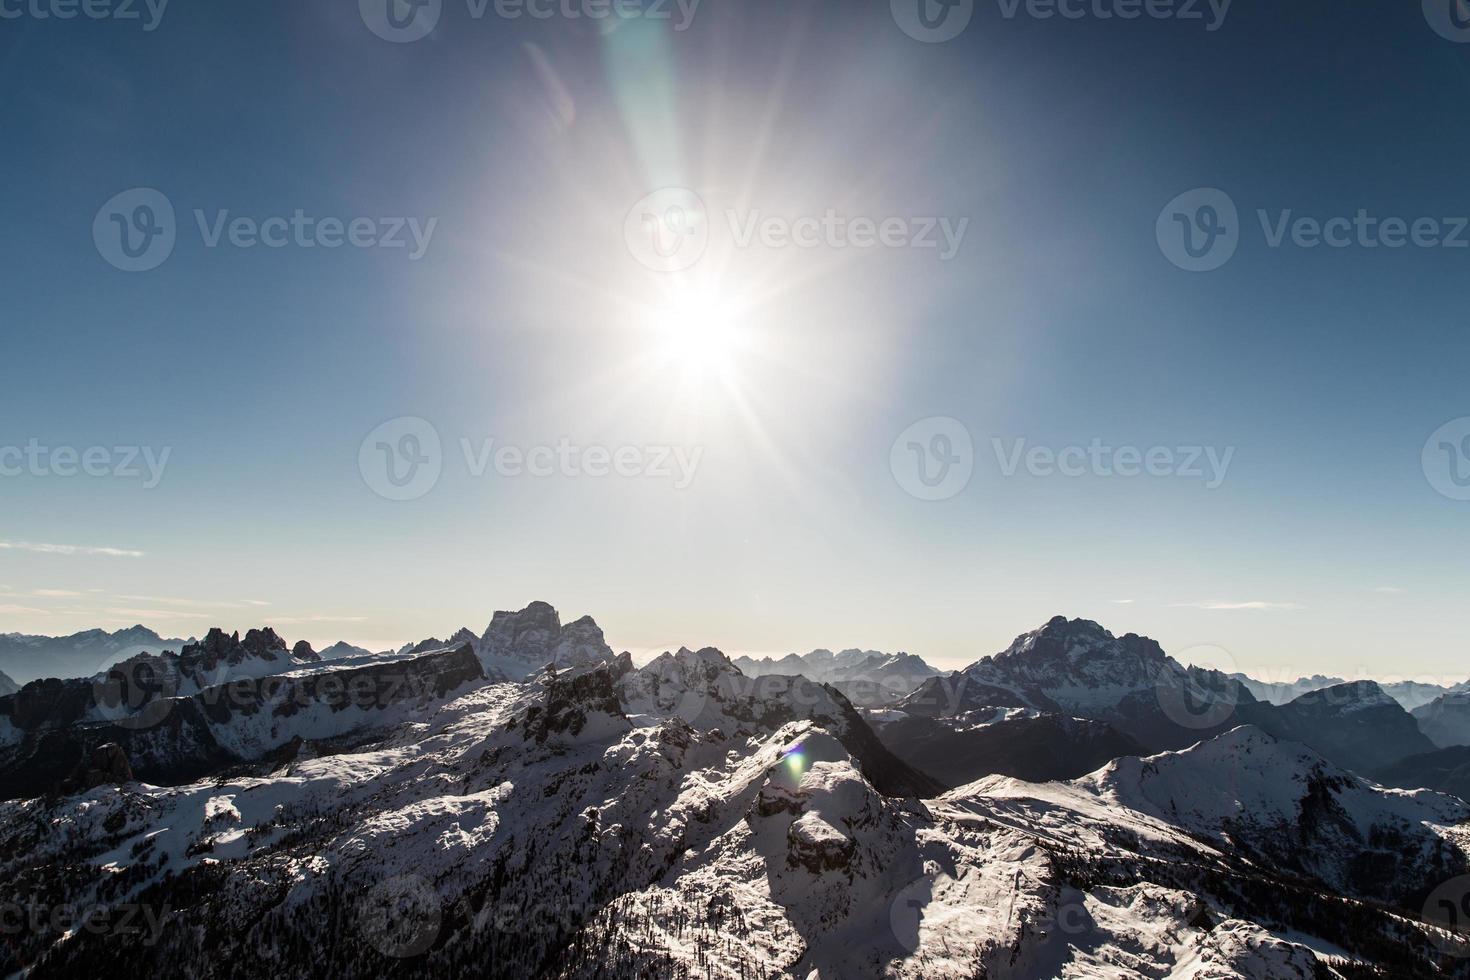 Dolomiti italienne prête pour la saison de ski photo